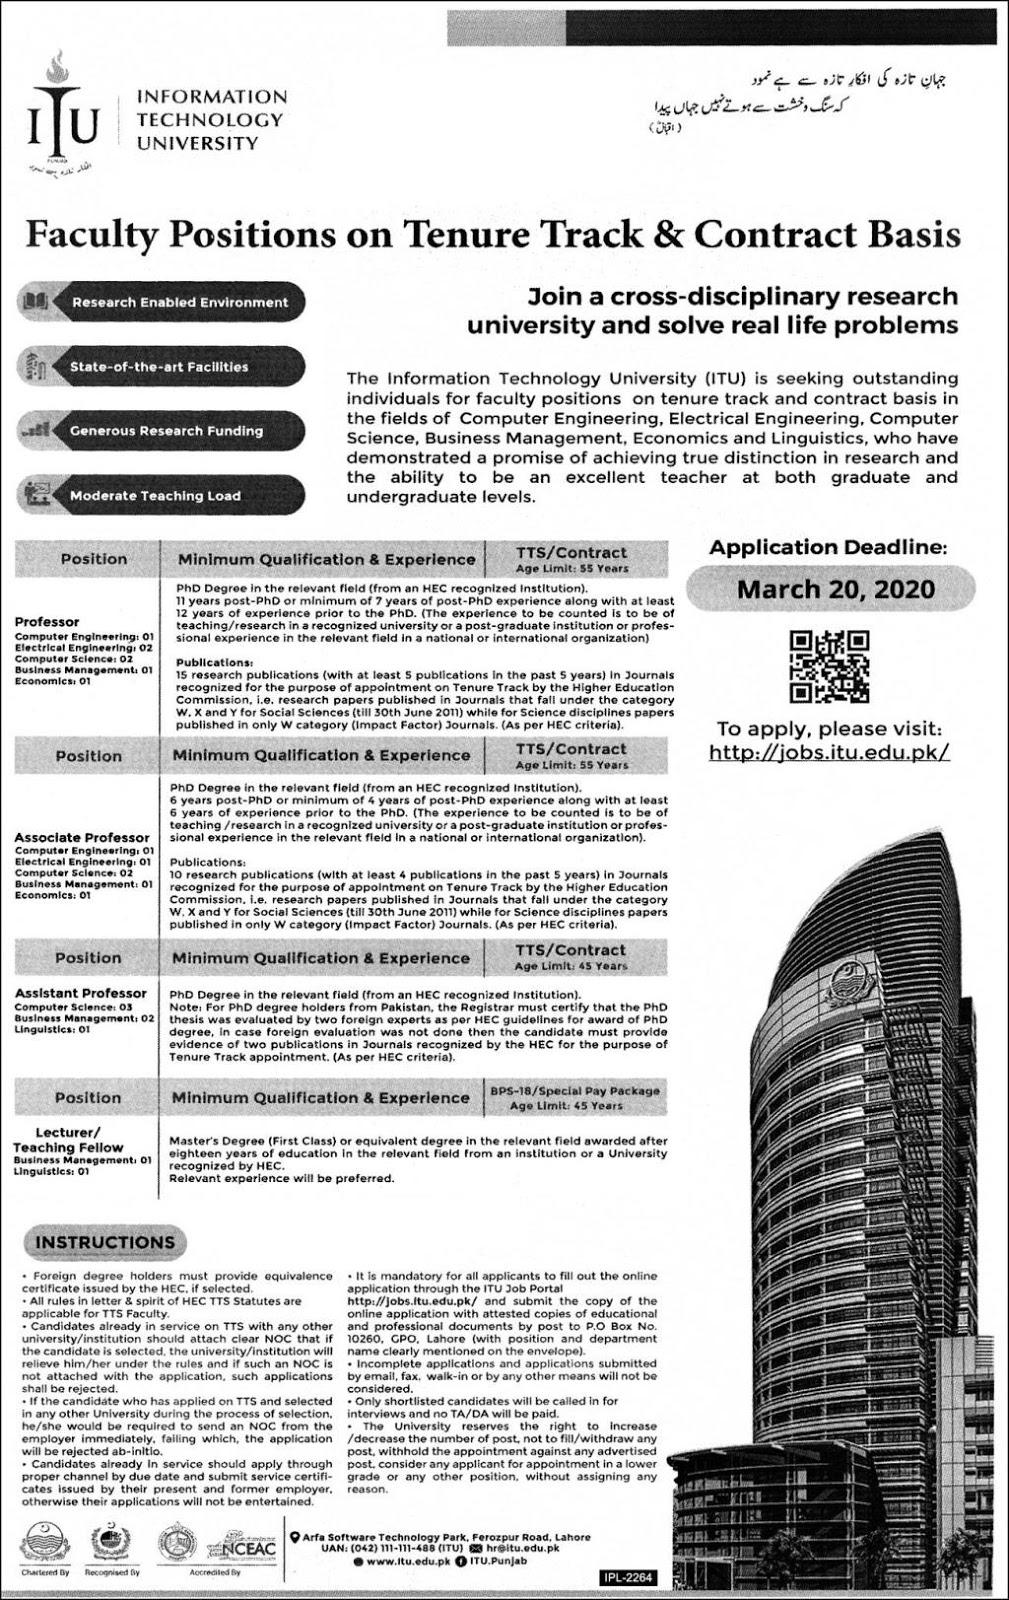 Latest jobs in Information Technology University 2020